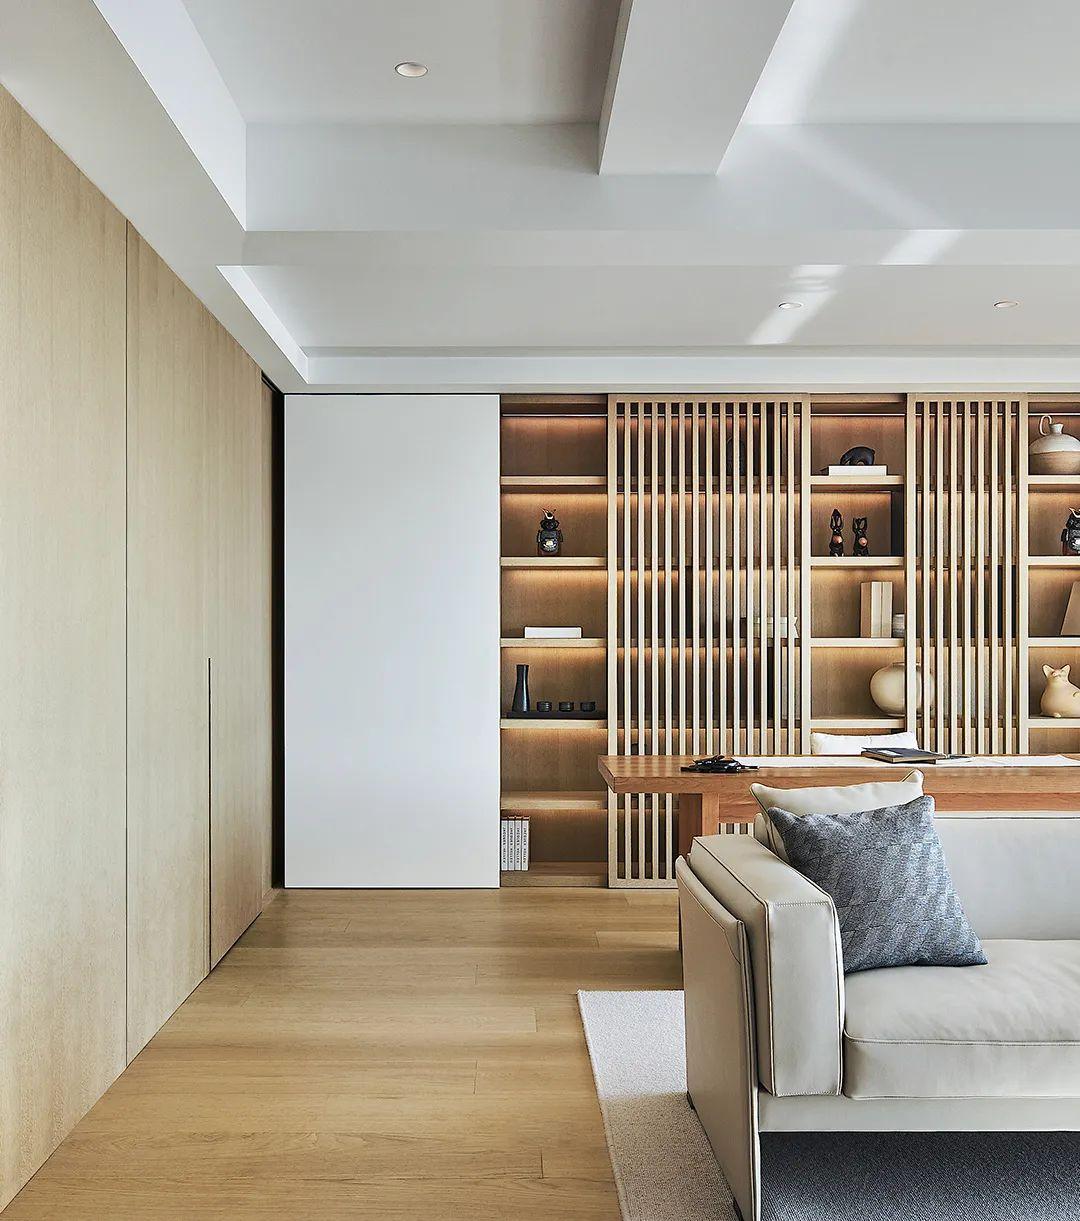 <span style='color: #ff0000'>新房裝修</span>鋪地磚還是木地板?首先要明確這幾點